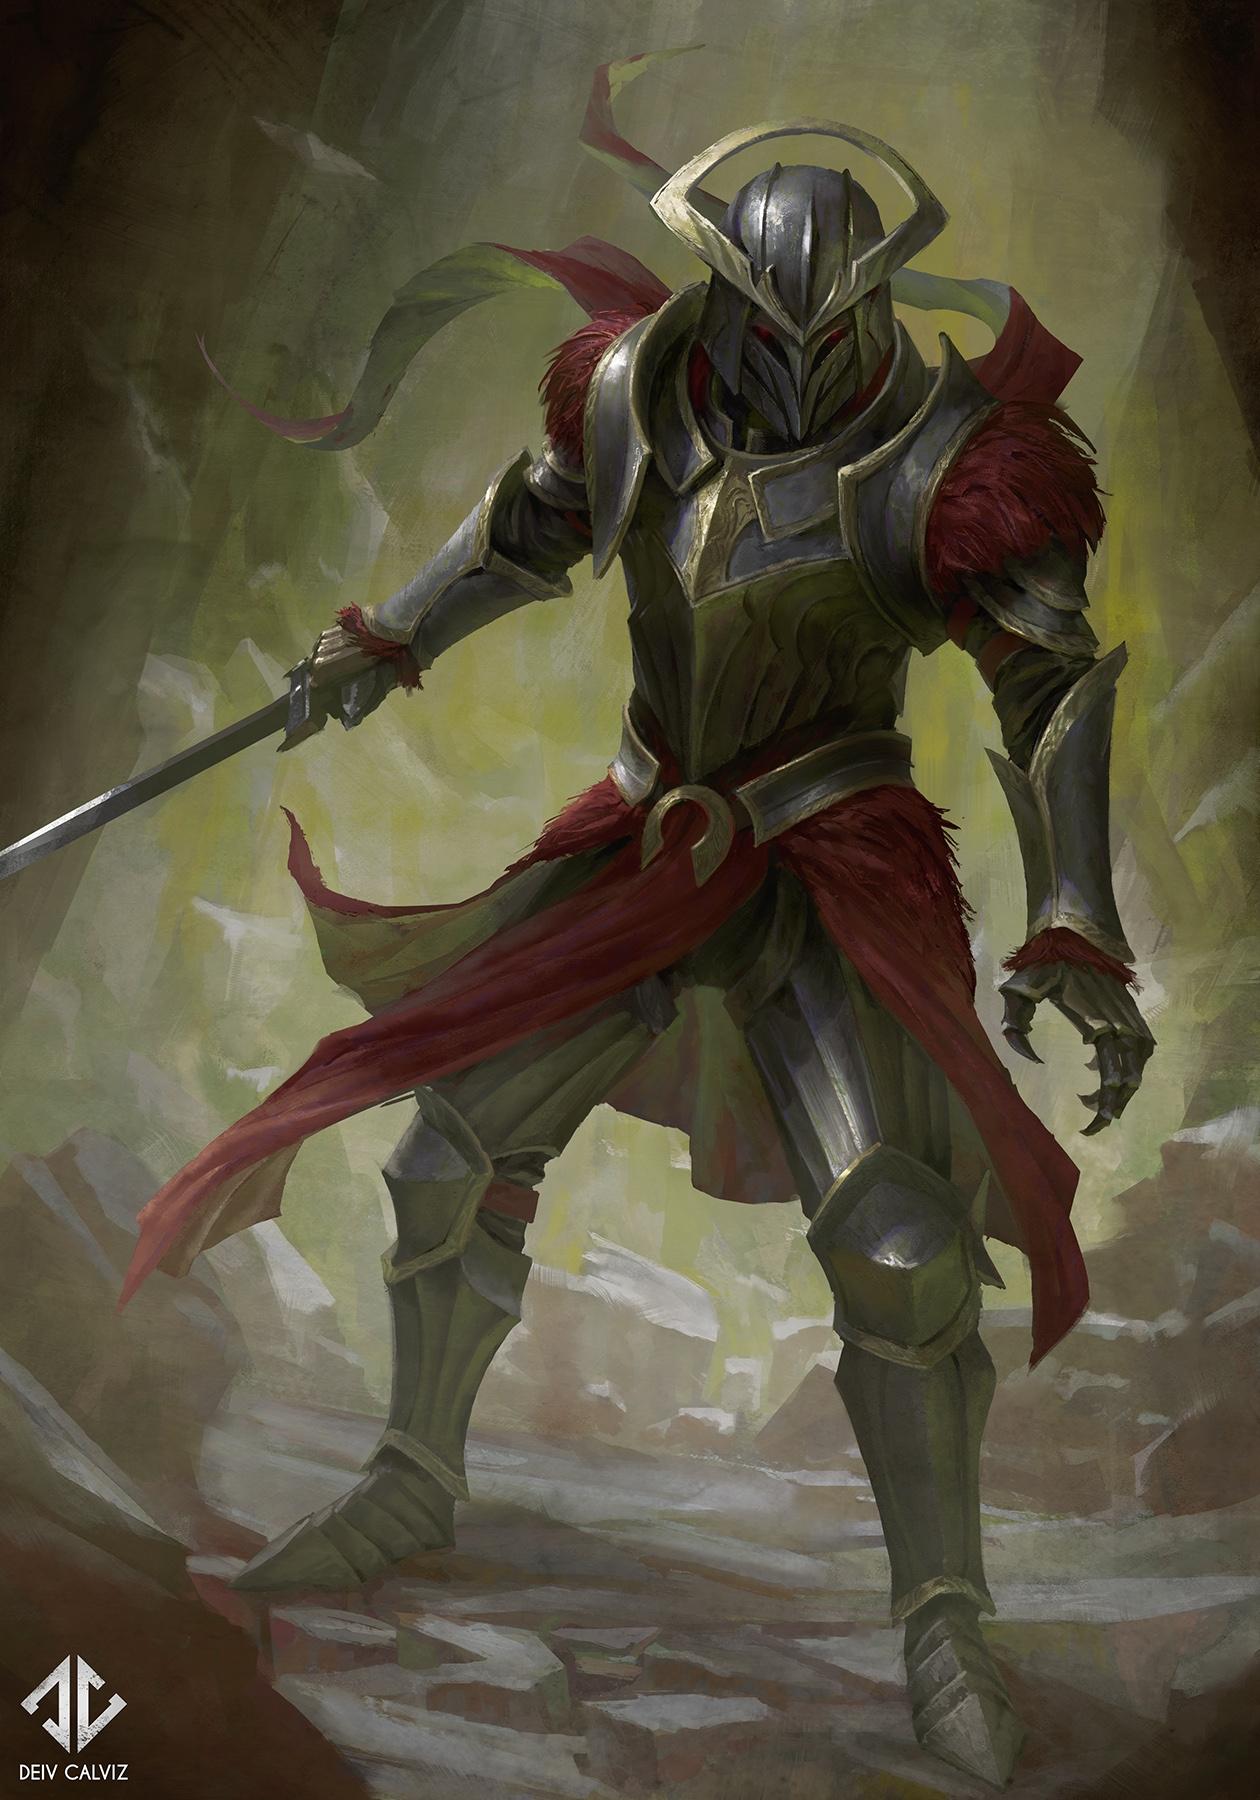 Red Knight_Deiv Calviz_Web